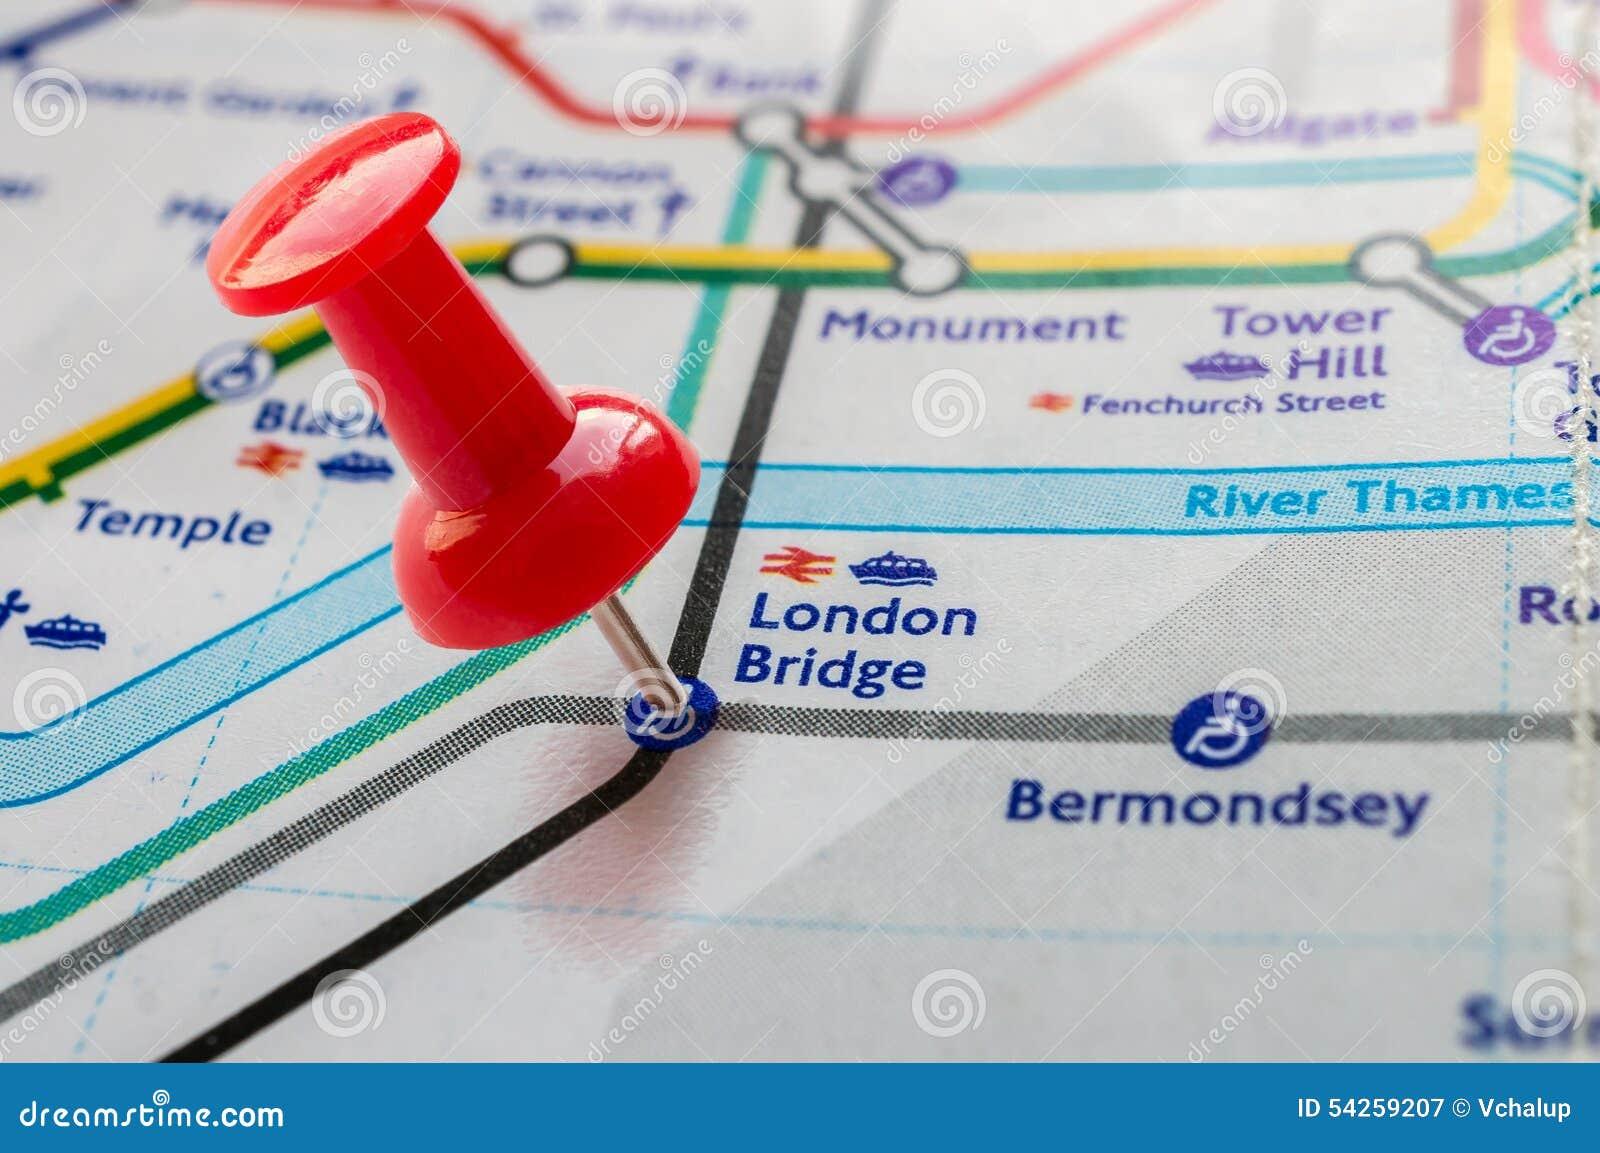 London Bridge Map.Thumbtack On London Bridge Station In London Underground Map Stock